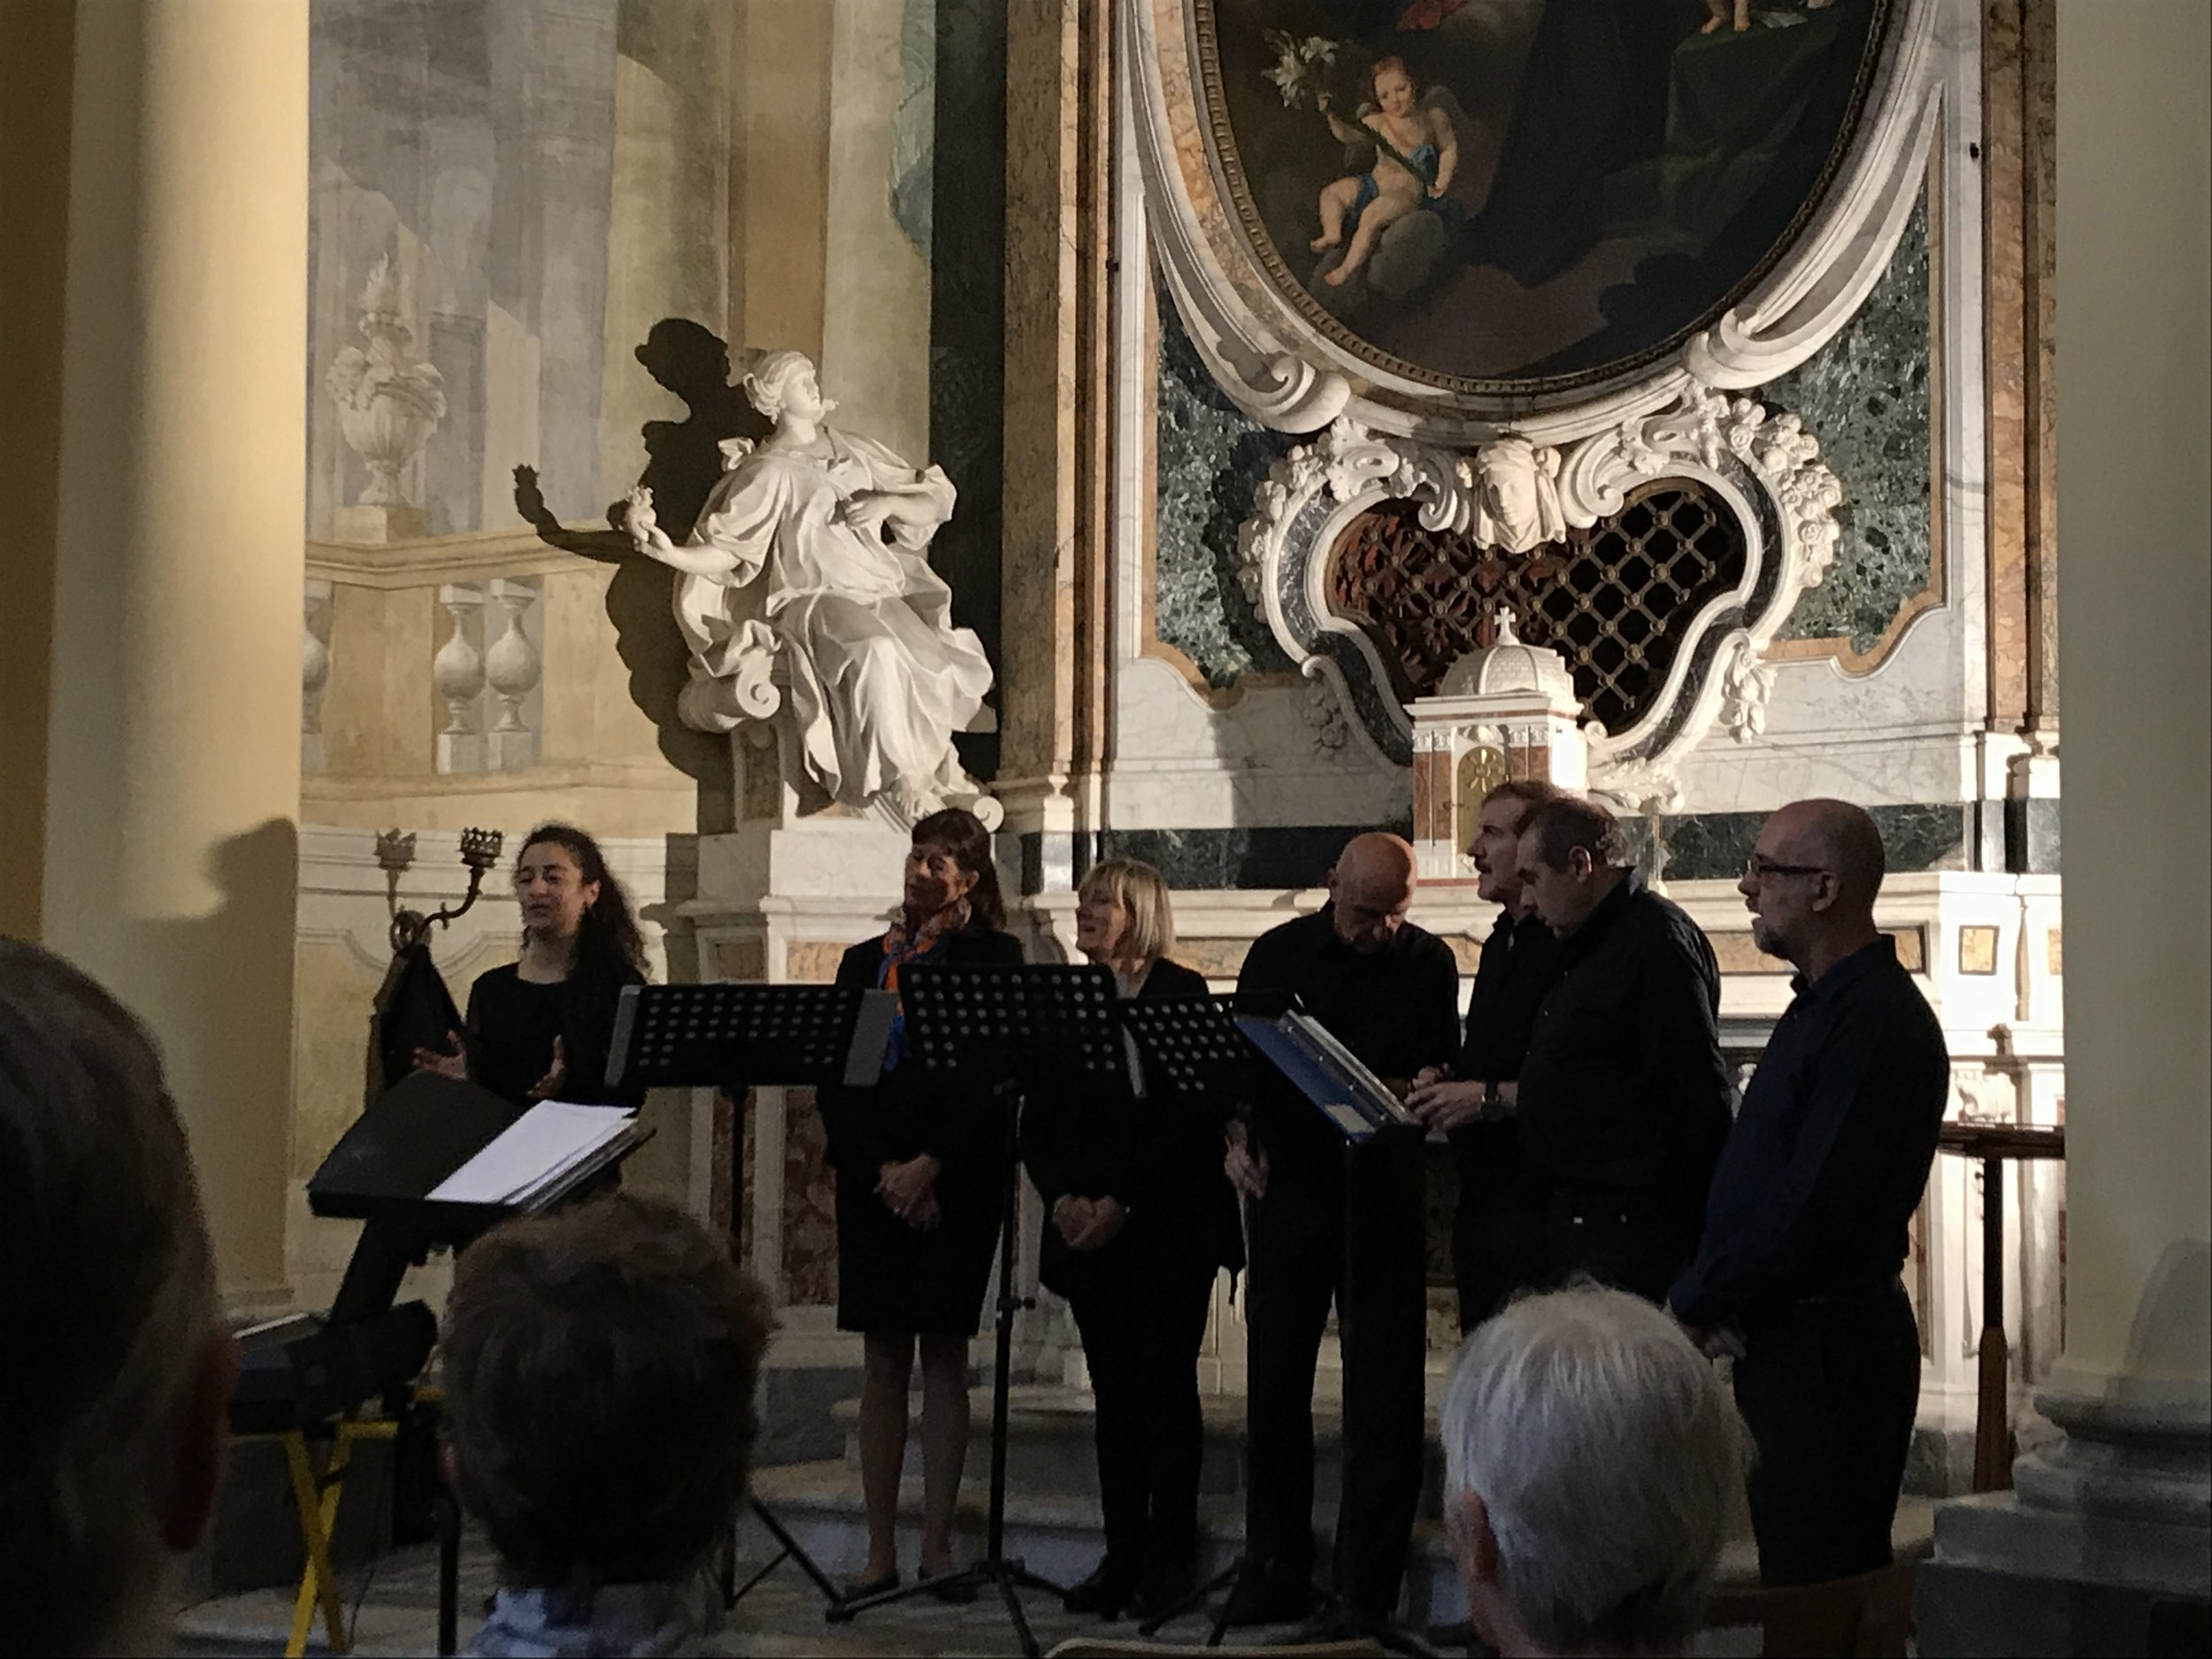 The Italian swing group Coro Puntaccapo